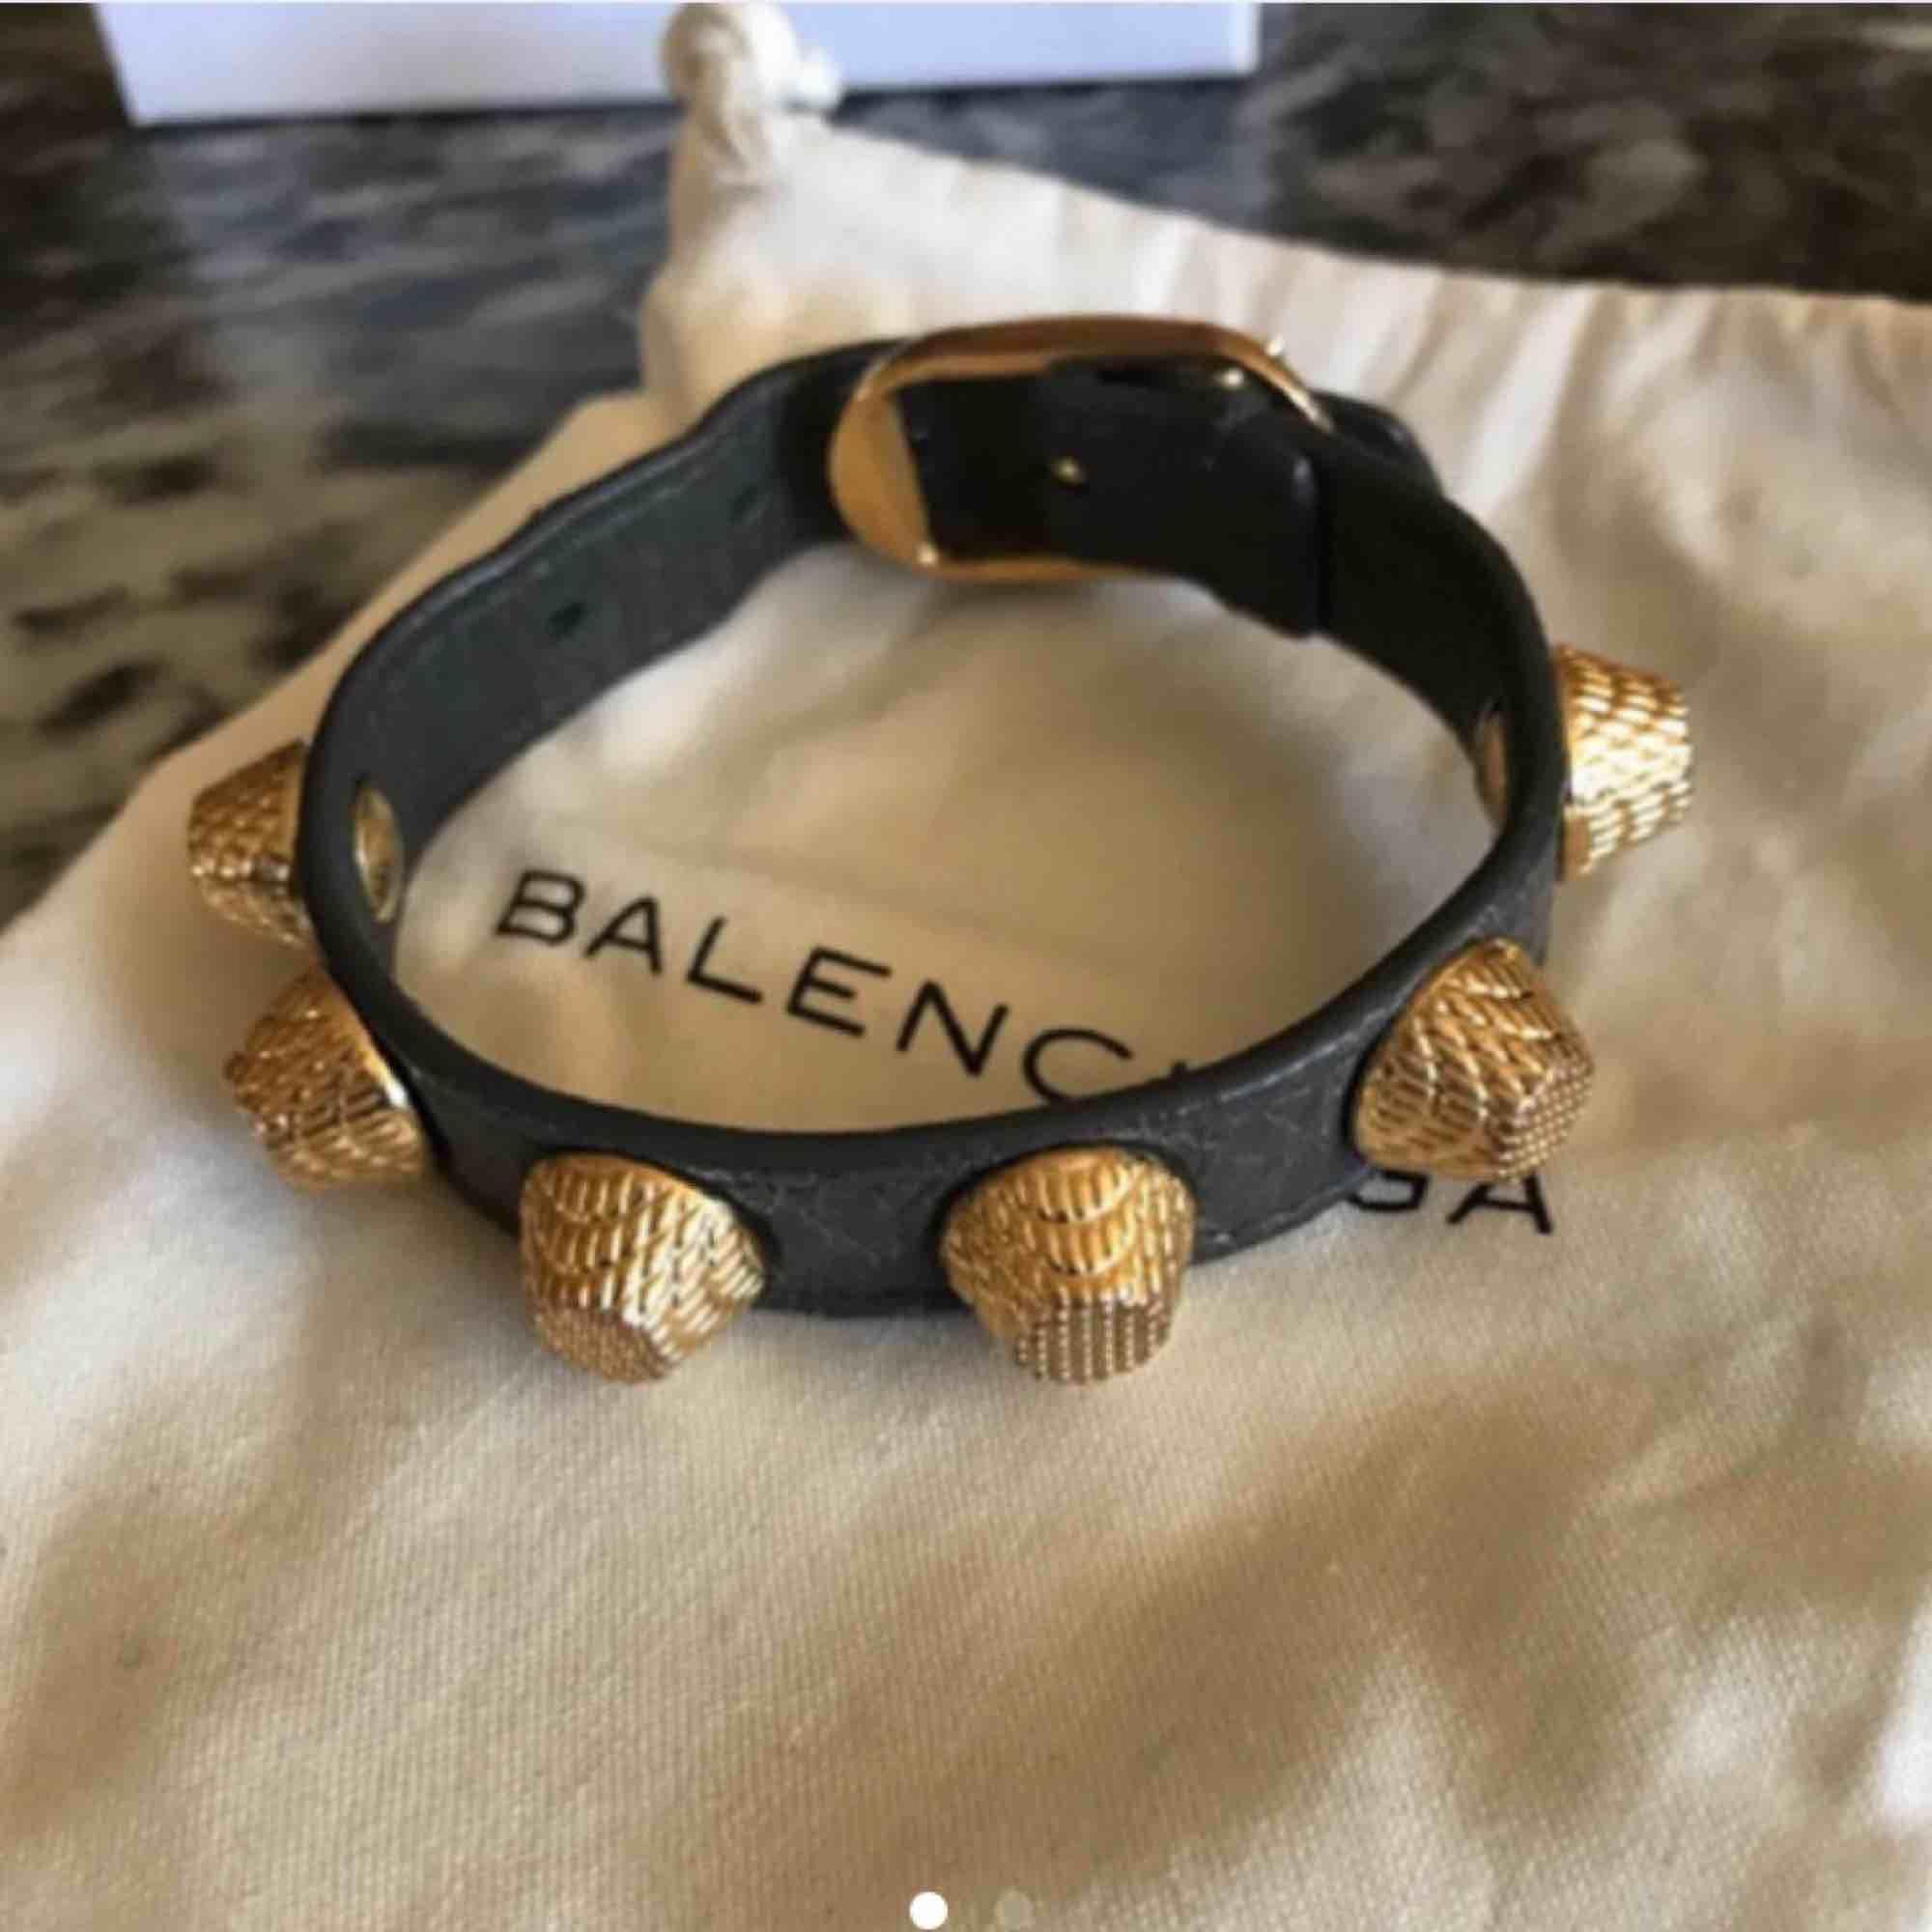 Balenciaga armband, frakt 50kr. Accessoarer.